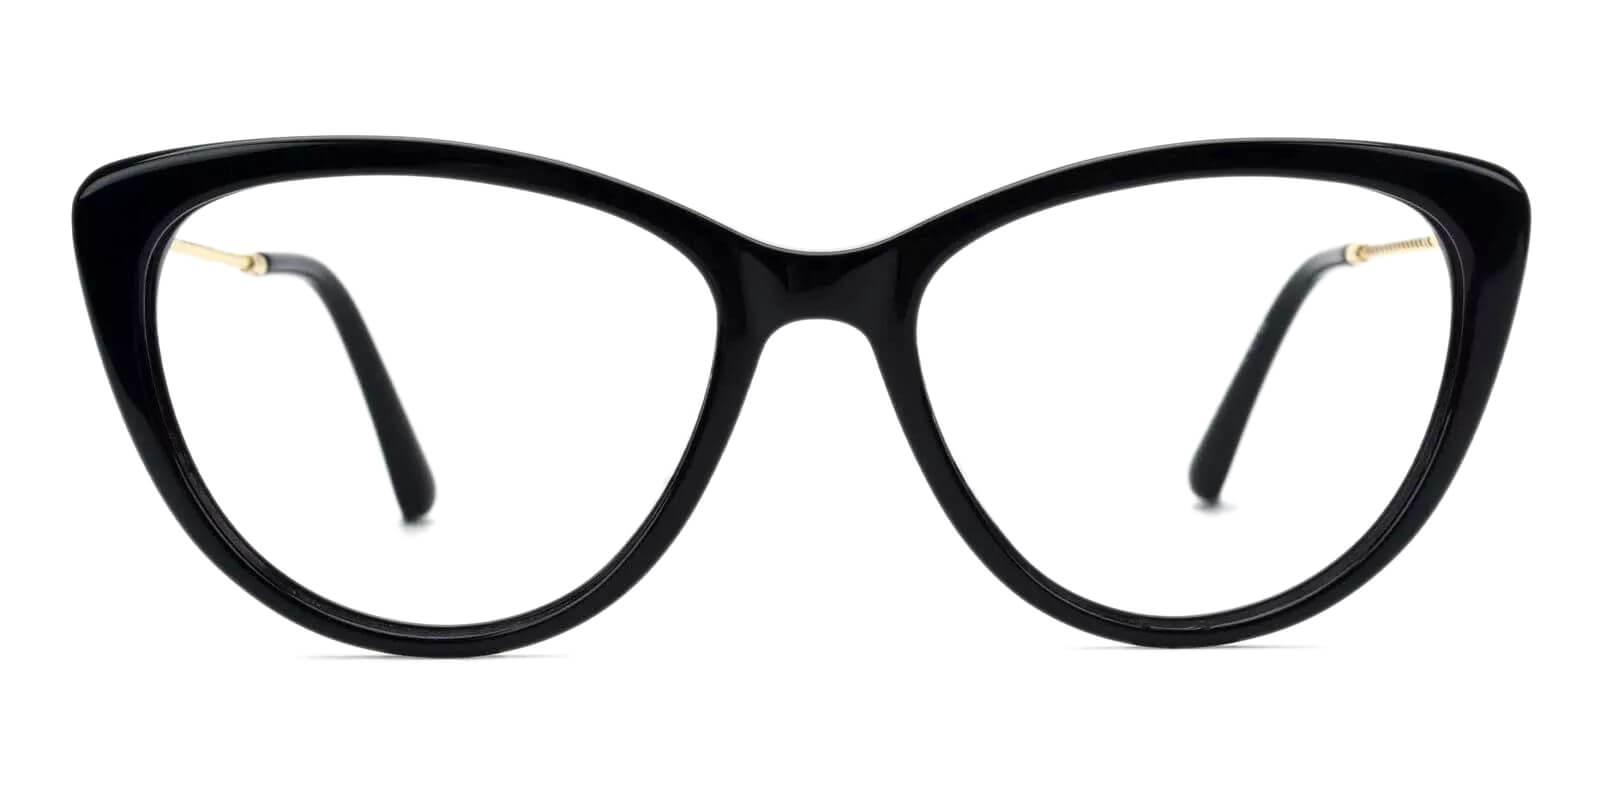 Satin Black Metal , Acetate SpringHinges , Fashion , UniversalBridgeFit , Eyeglasses Frames from ABBE Glasses